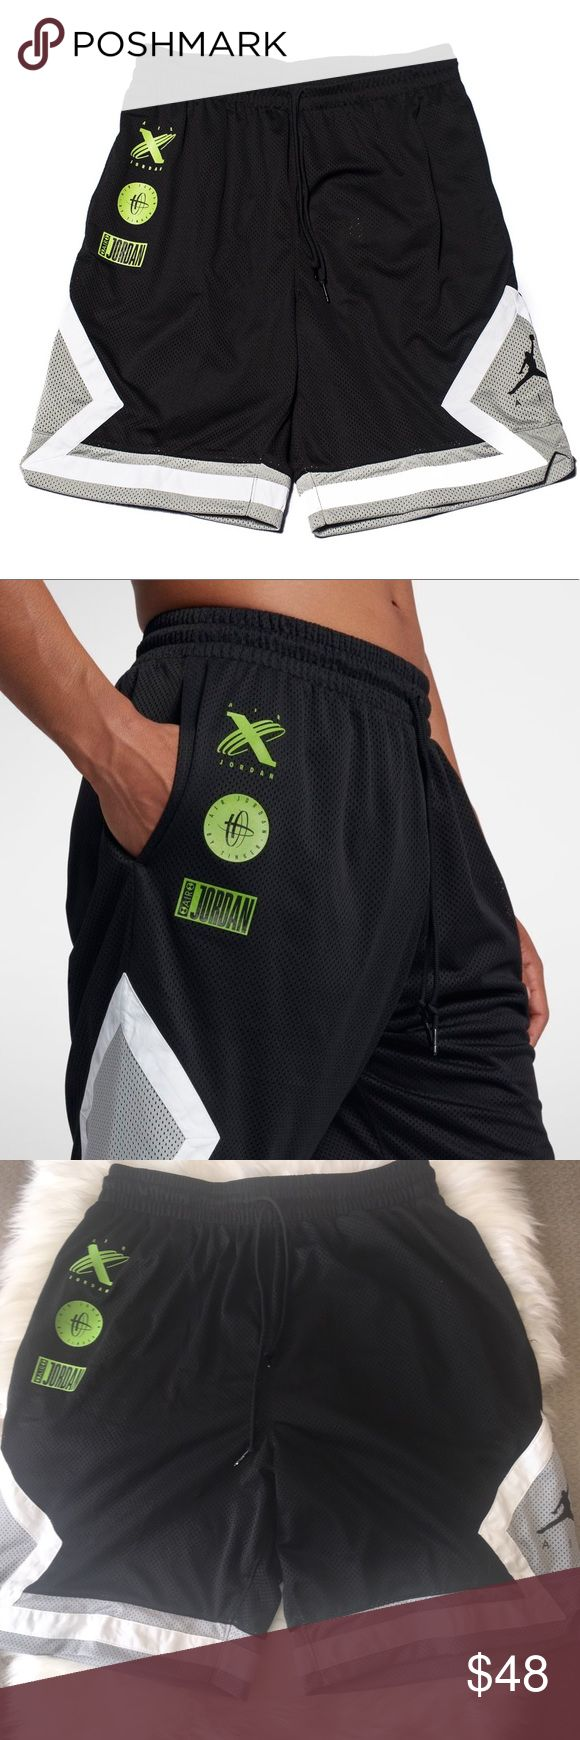 Nike Air Jordan von Tinker Story Shorts 2xxl Nike Air Jordan von Tinker Story …   – My Posh Picks